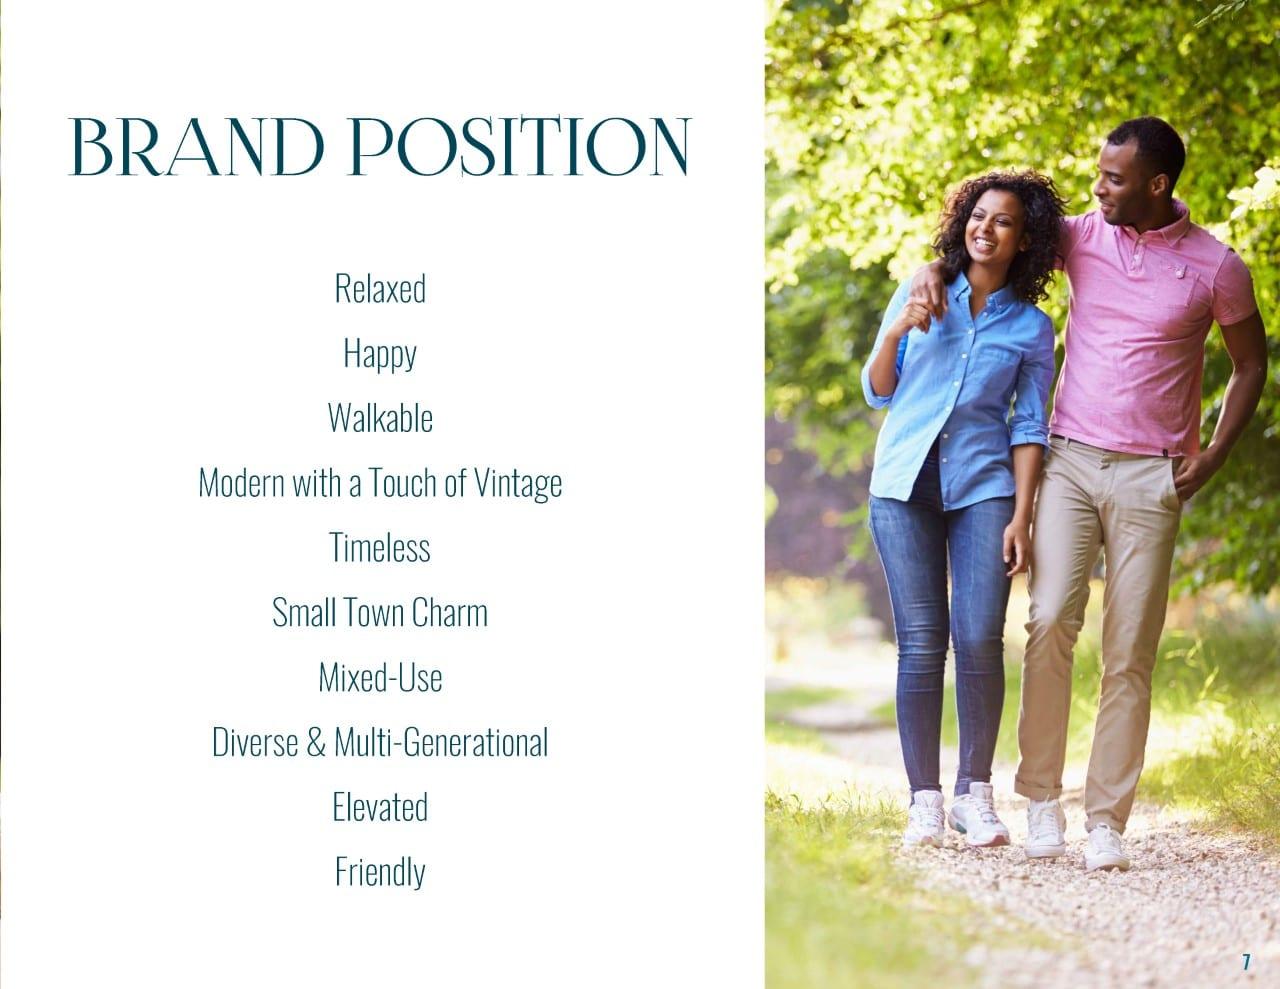 Rose & Main Brand Standards - Place Based Branding Position